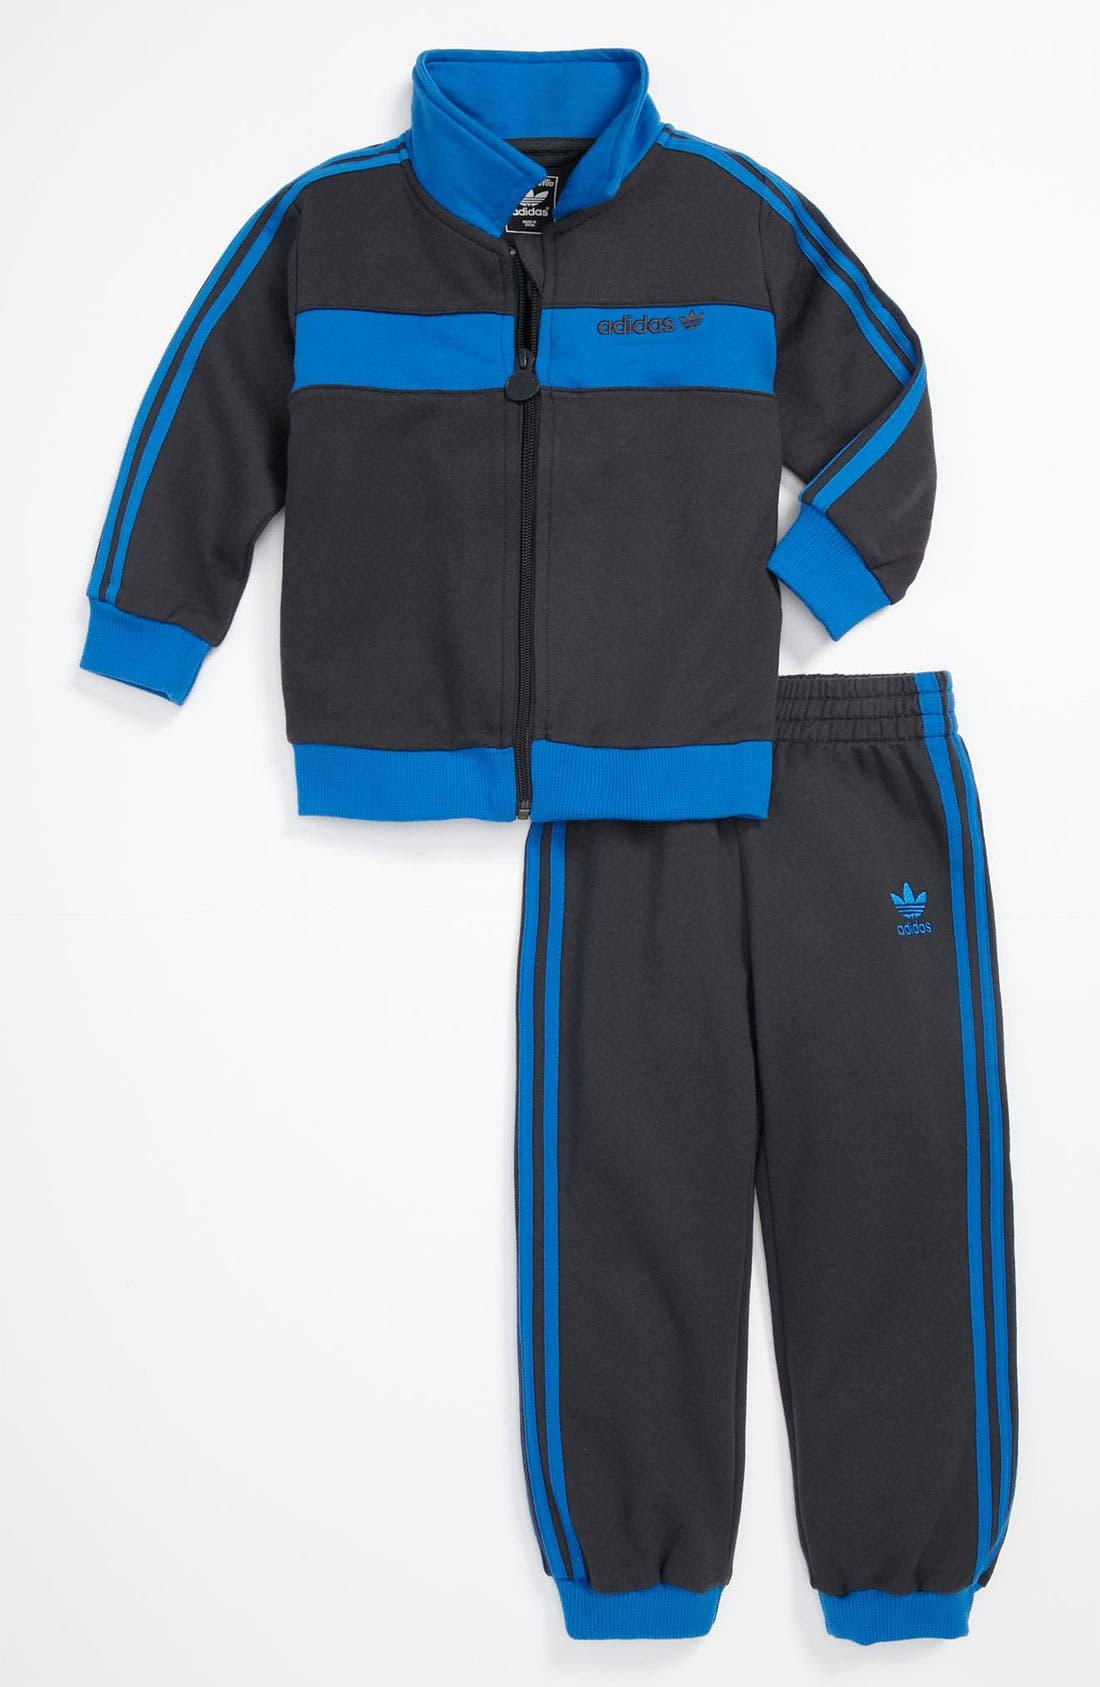 Main Image - adidas 'Breckenbauer' Jacket & Pants (Infant)